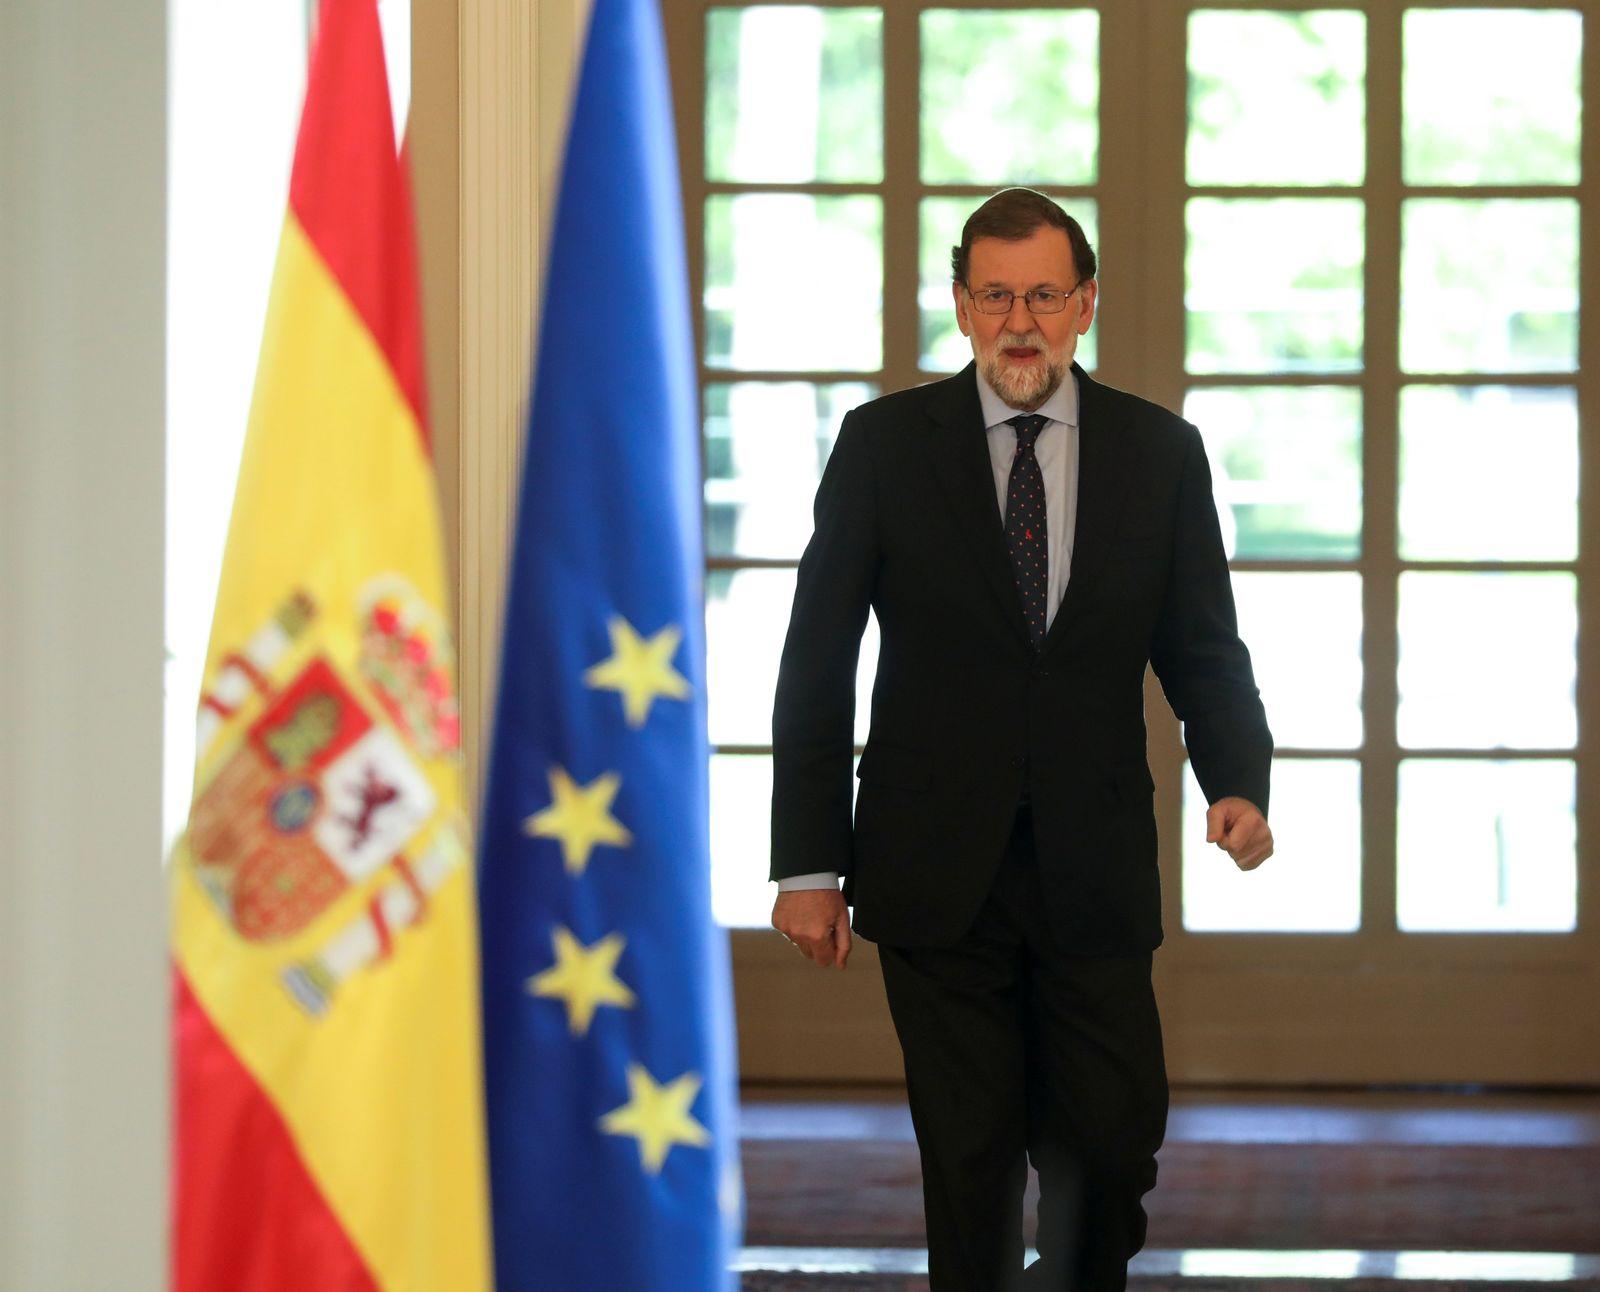 SPAIN-ETA/RAJOY